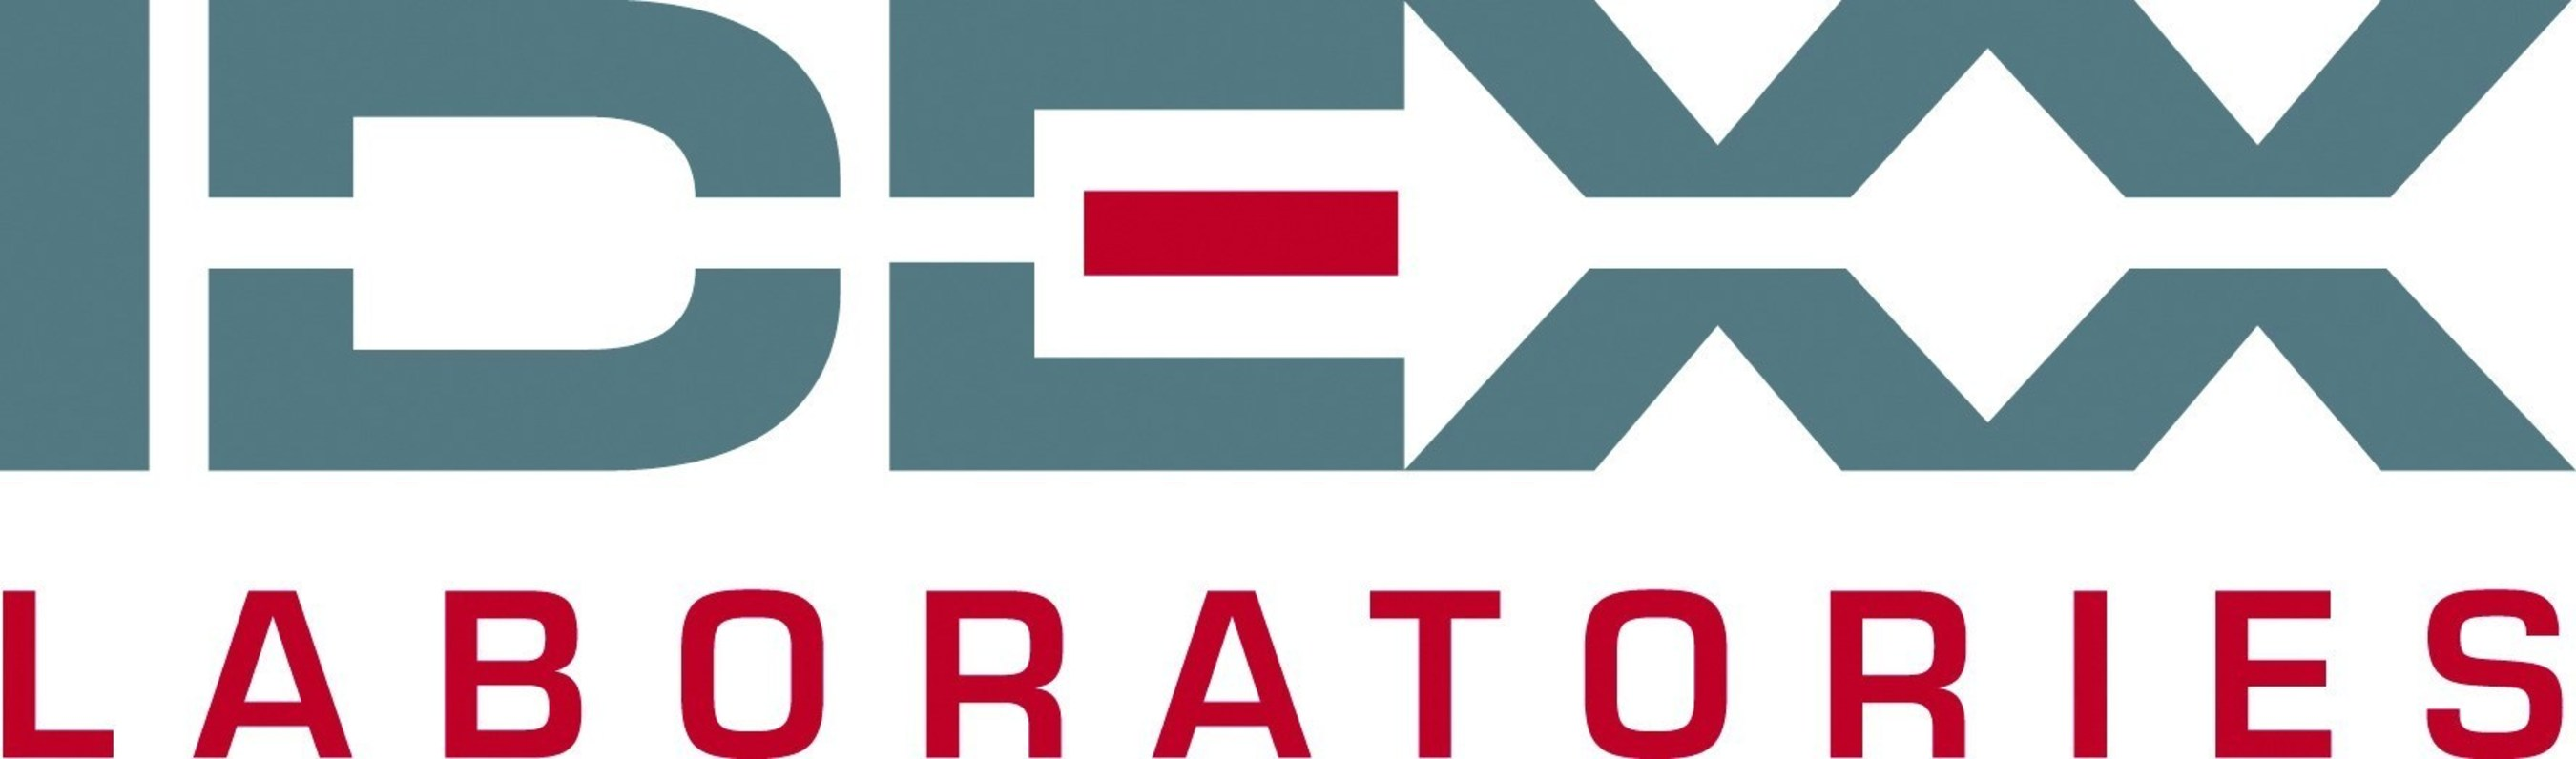 IDEXX Laboratories, Inc. (PRNewsFoto/IDEXX Laboratories, Inc.)